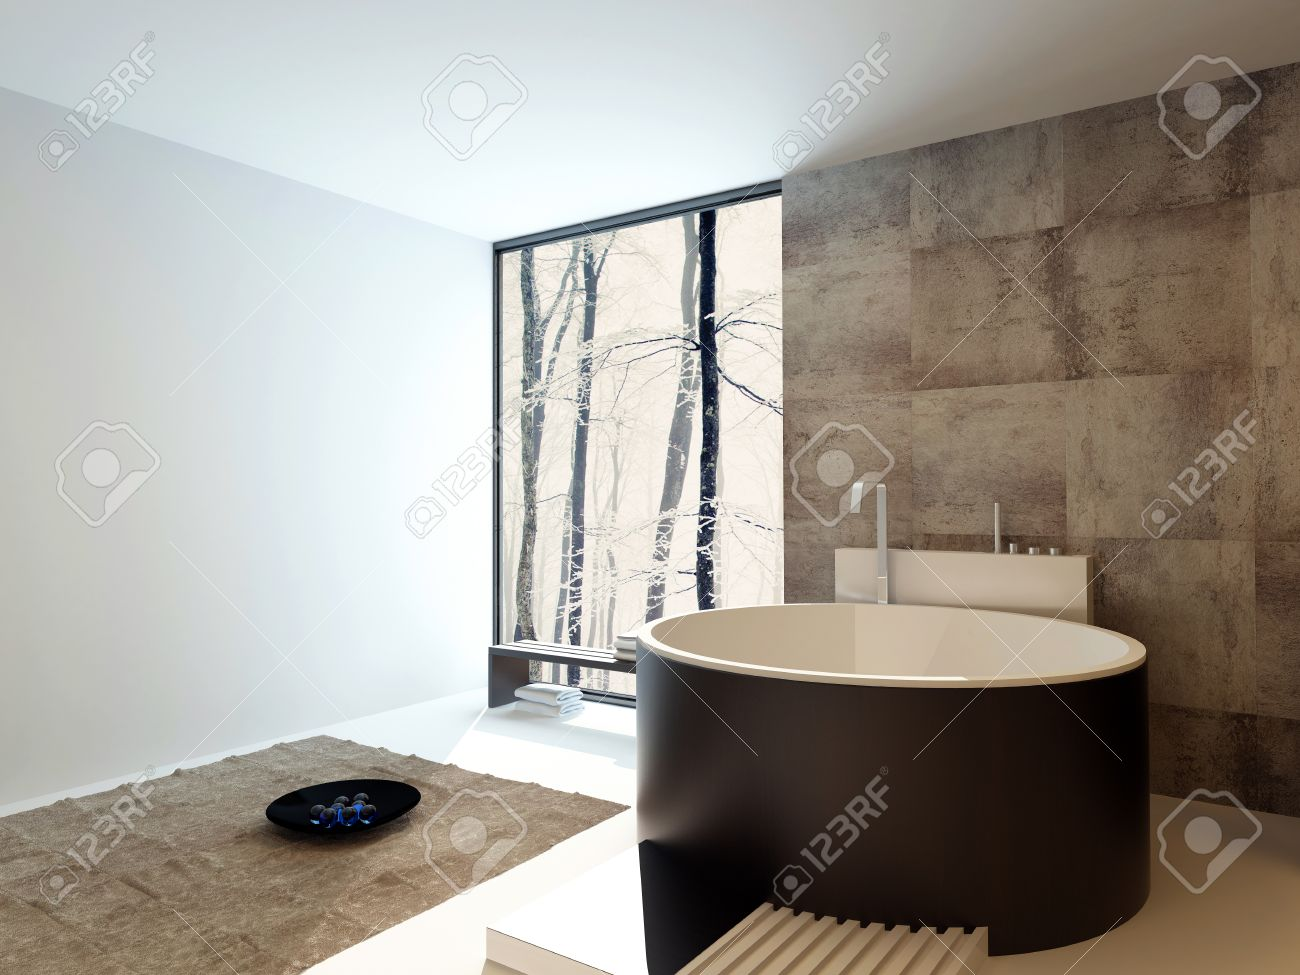 Hublot Salle De Bain Sarlam ~ neon salle de bain avec neon salle de bain avec with neon salle de